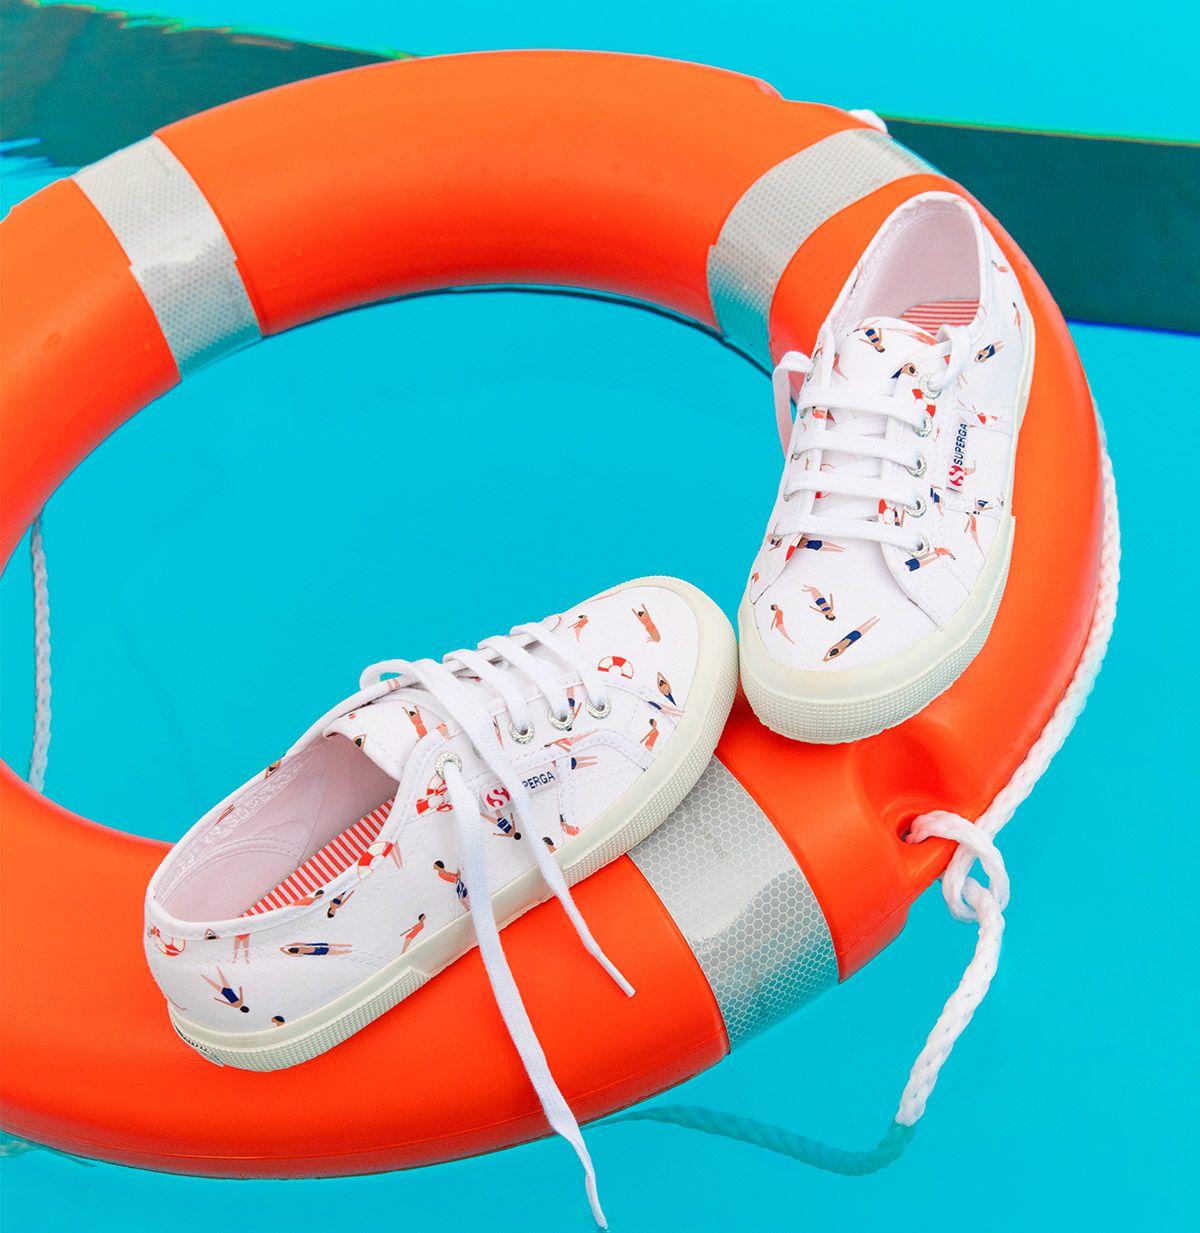 2750-FANTASY COTU - White Swimming